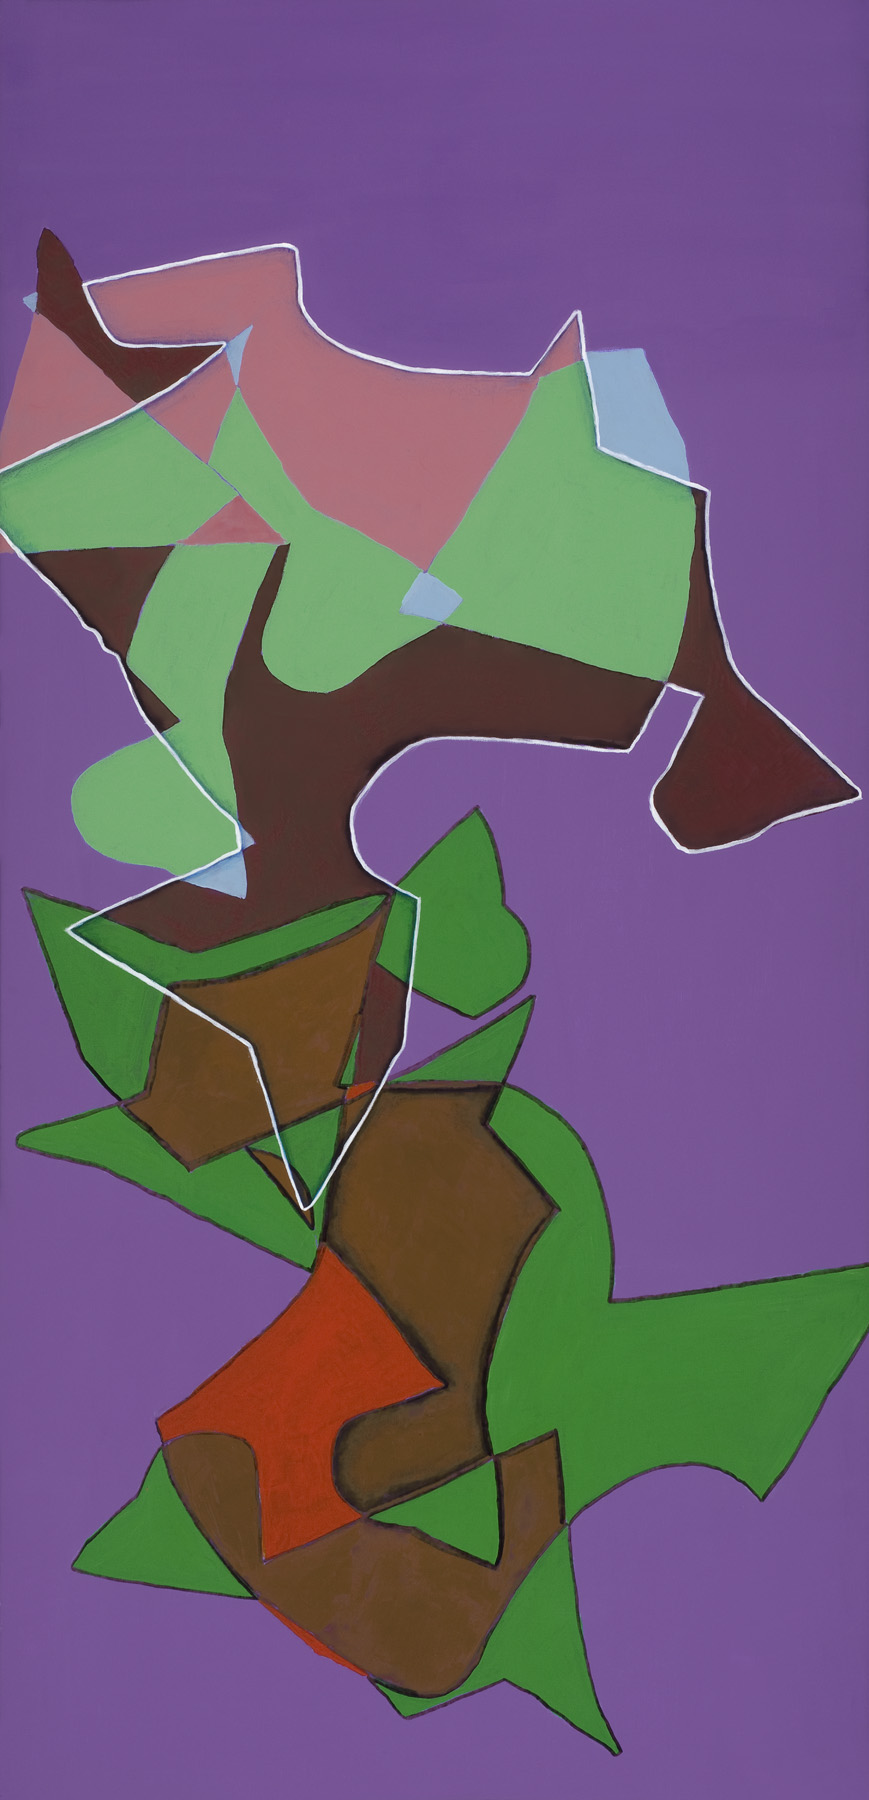 ARTS 4 ALL 018 copy.jpg